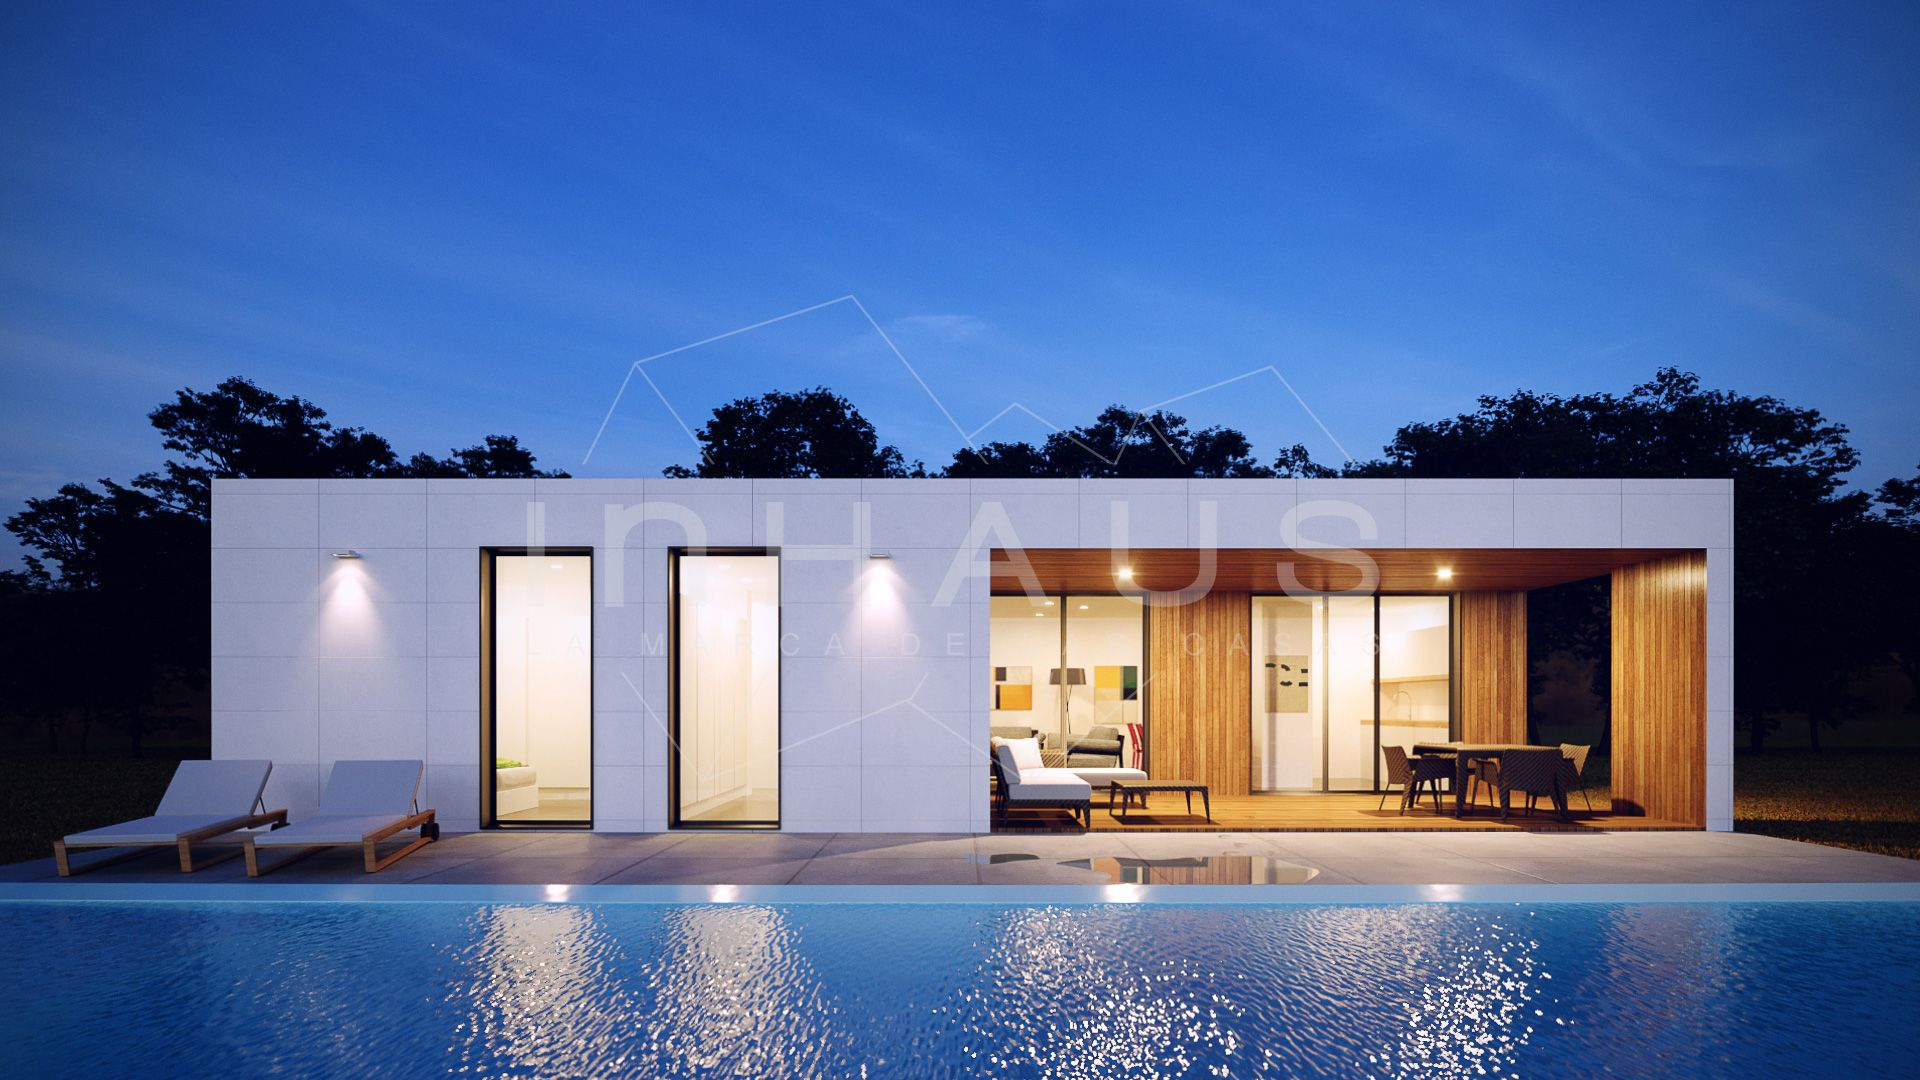 Casa modular de hormig n modelo chipiona 3d 1p inhaus chalet bayas pinterest casas - Casas en chipiona ...